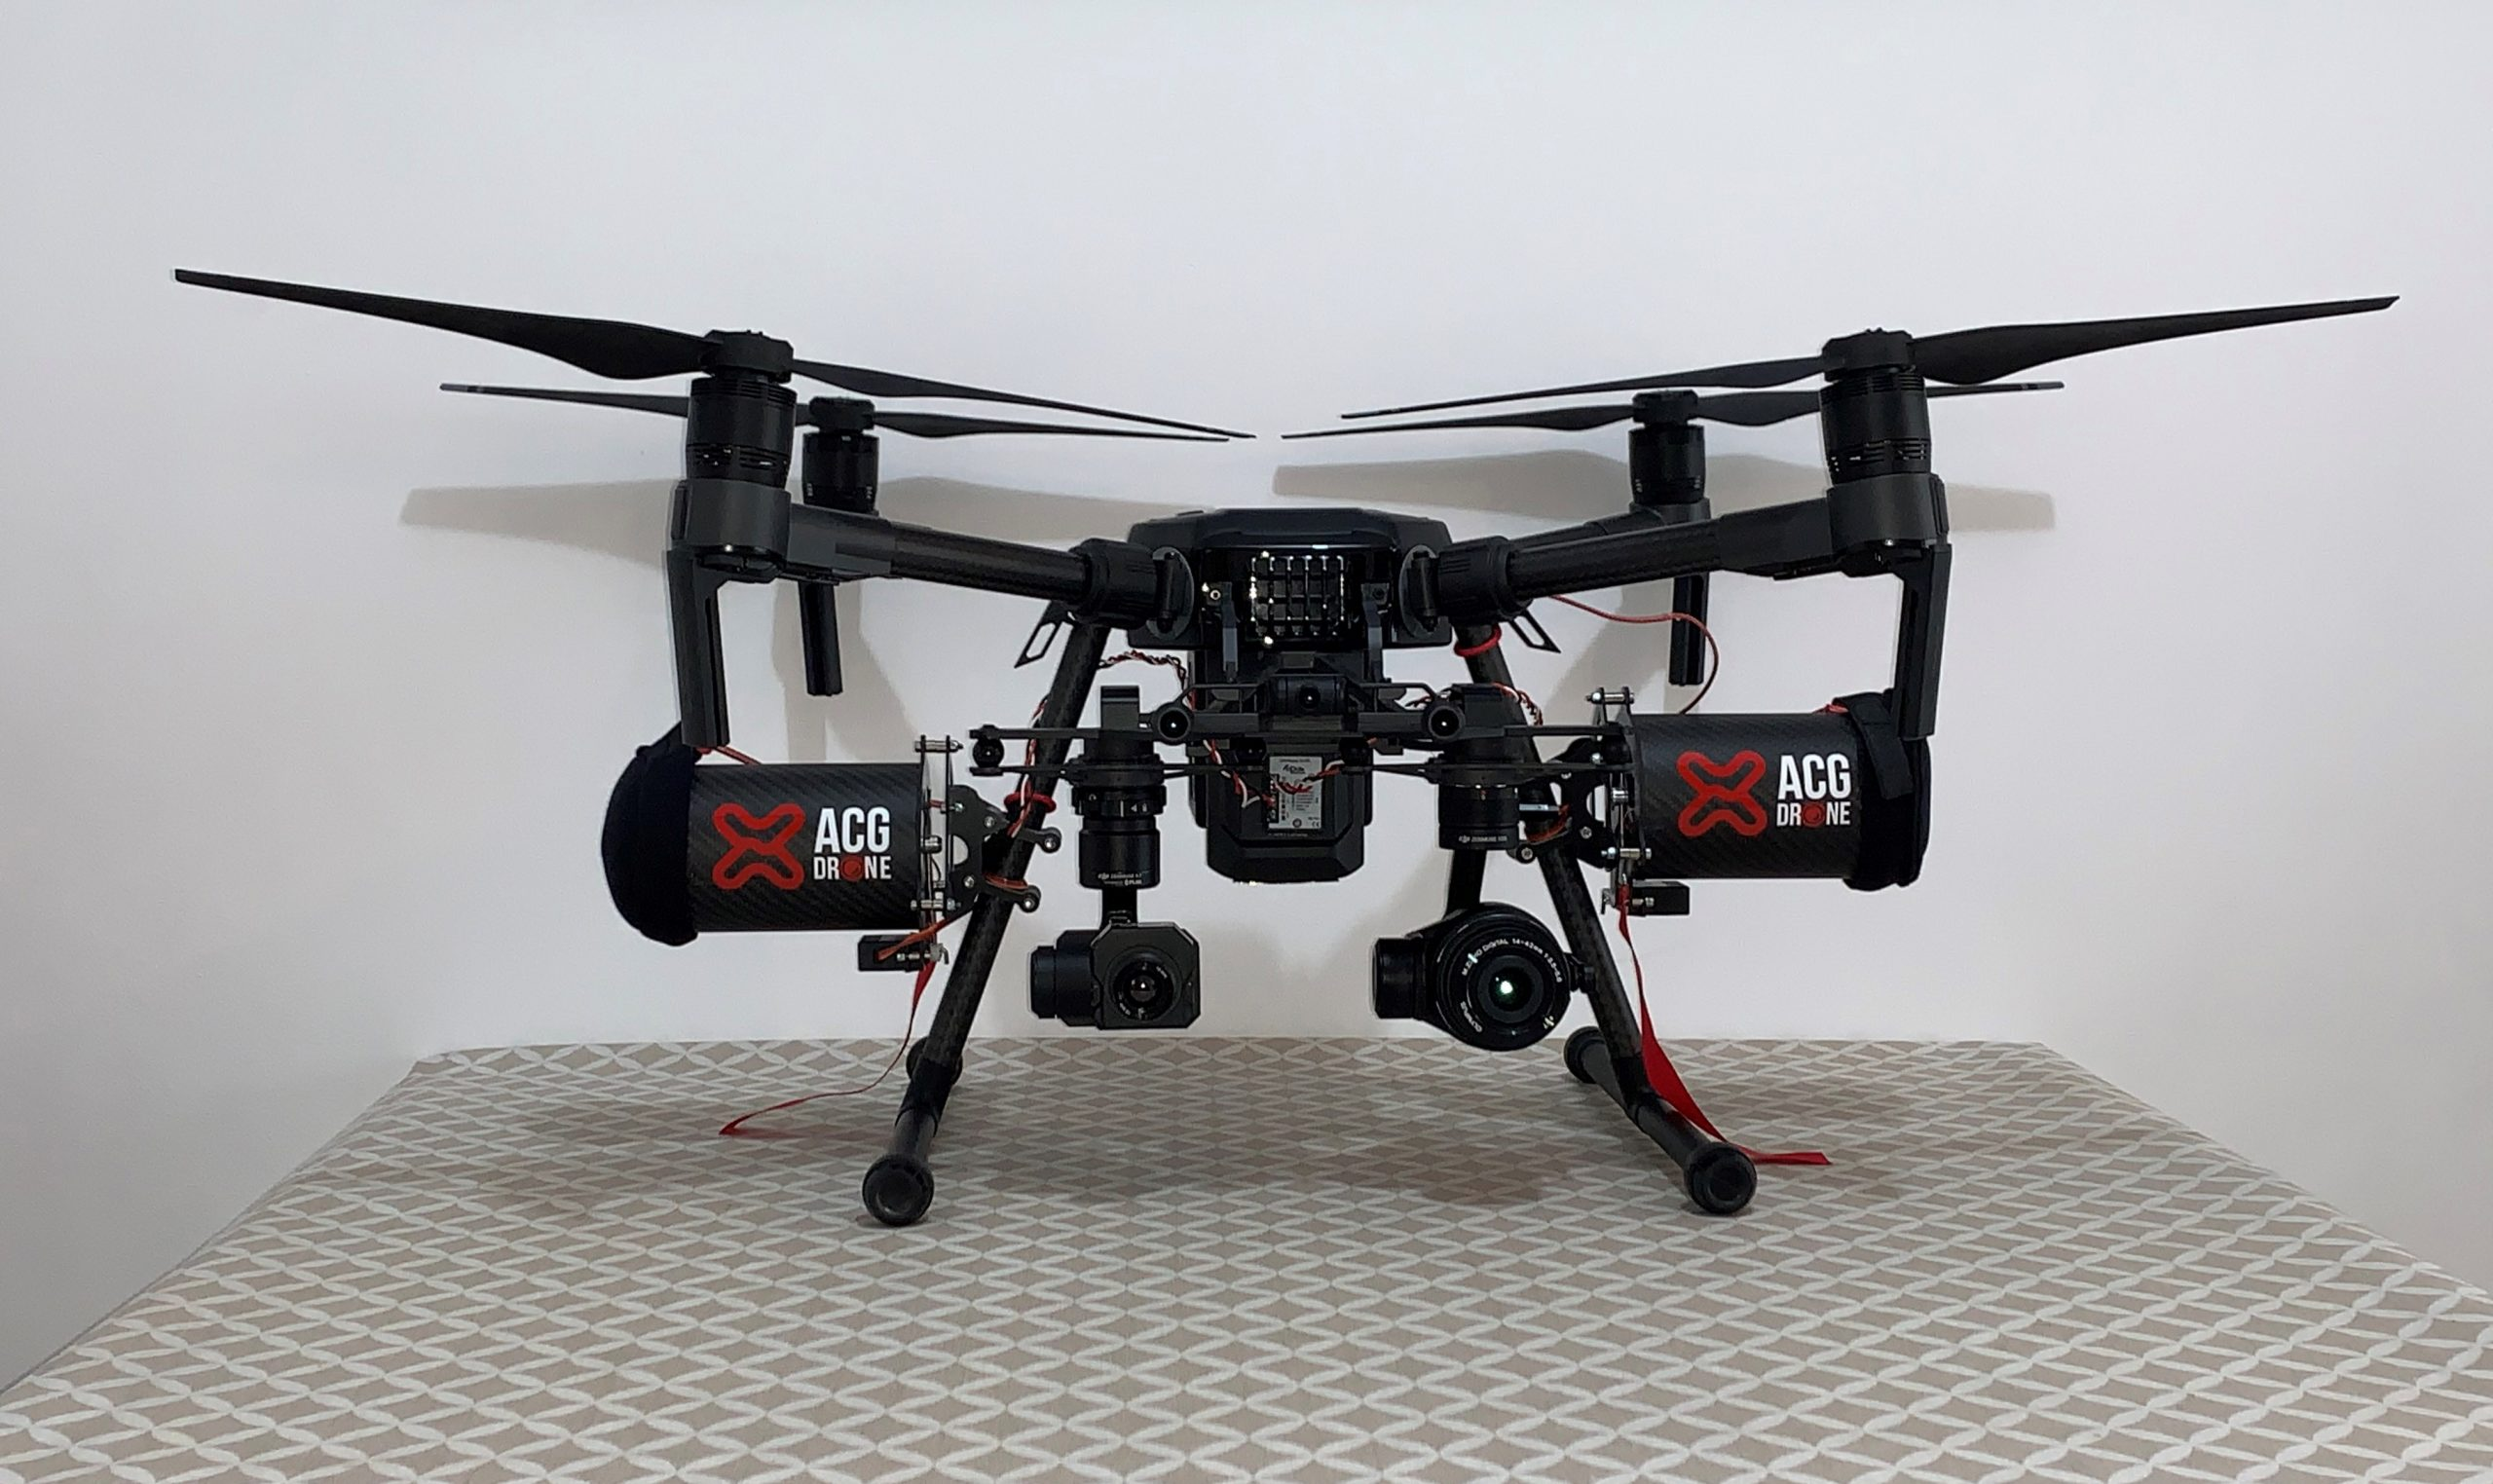 ACG Drone - DJI Matrice 210